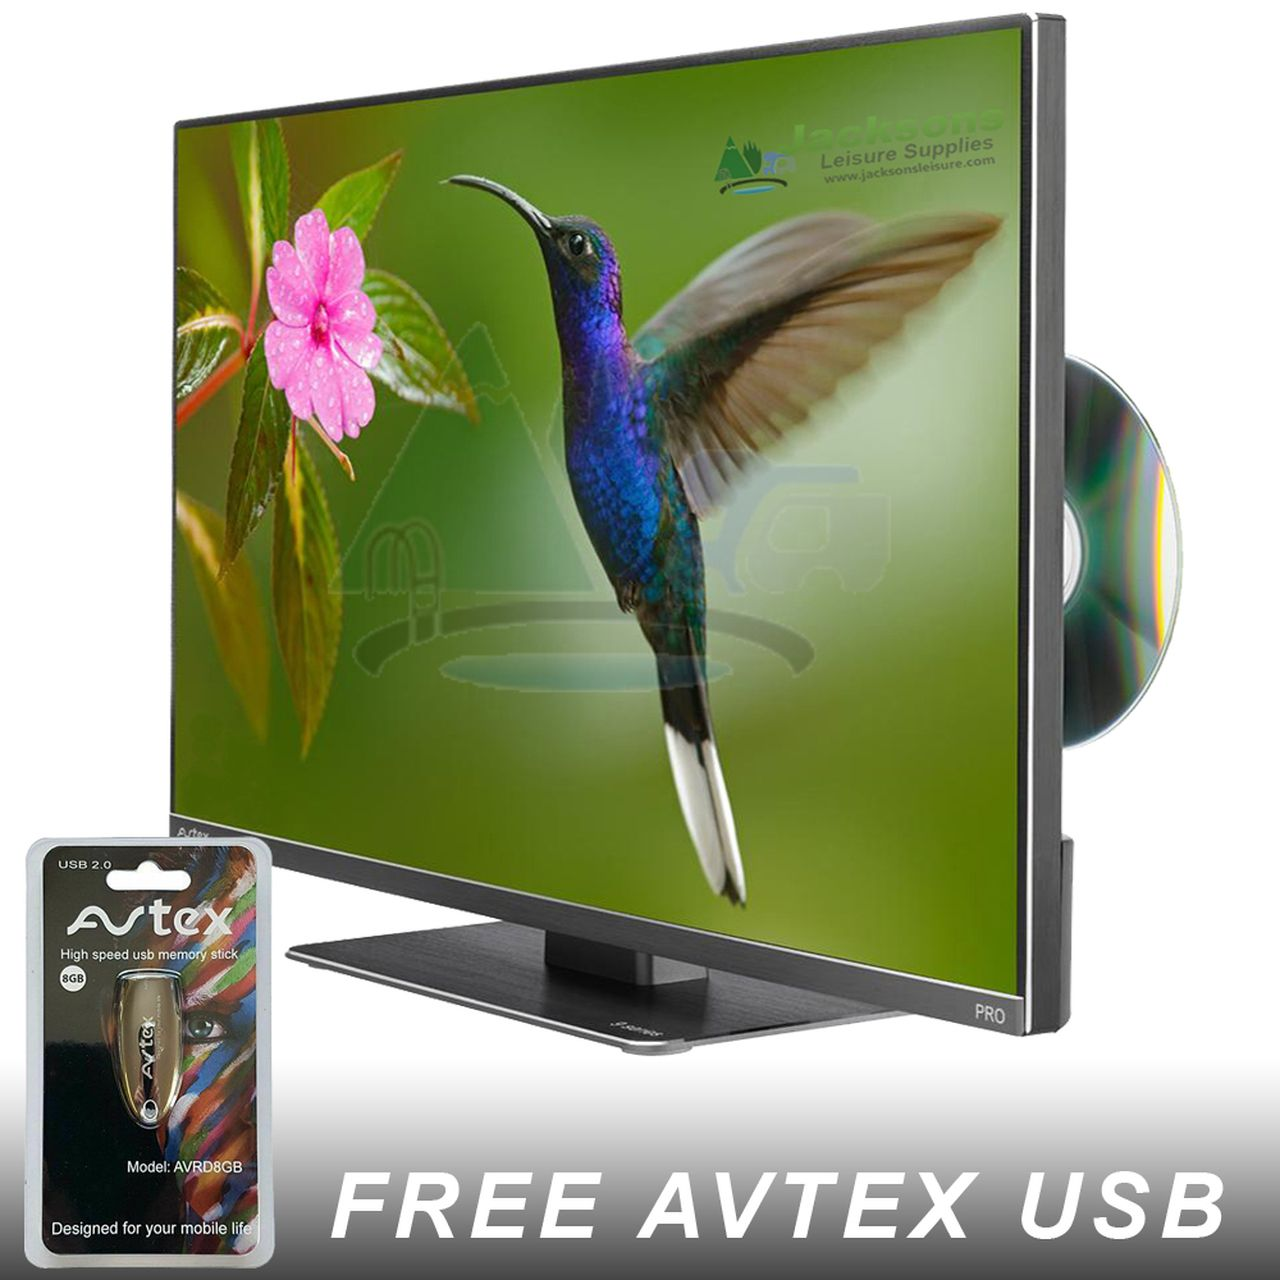 Avtex L219drs Pro 12v Led Tv Freeview Hd Sat Hd Dvd Rec Caravan Motorhome Tv In 2020 Led Tv Digital Tuner 12v Led